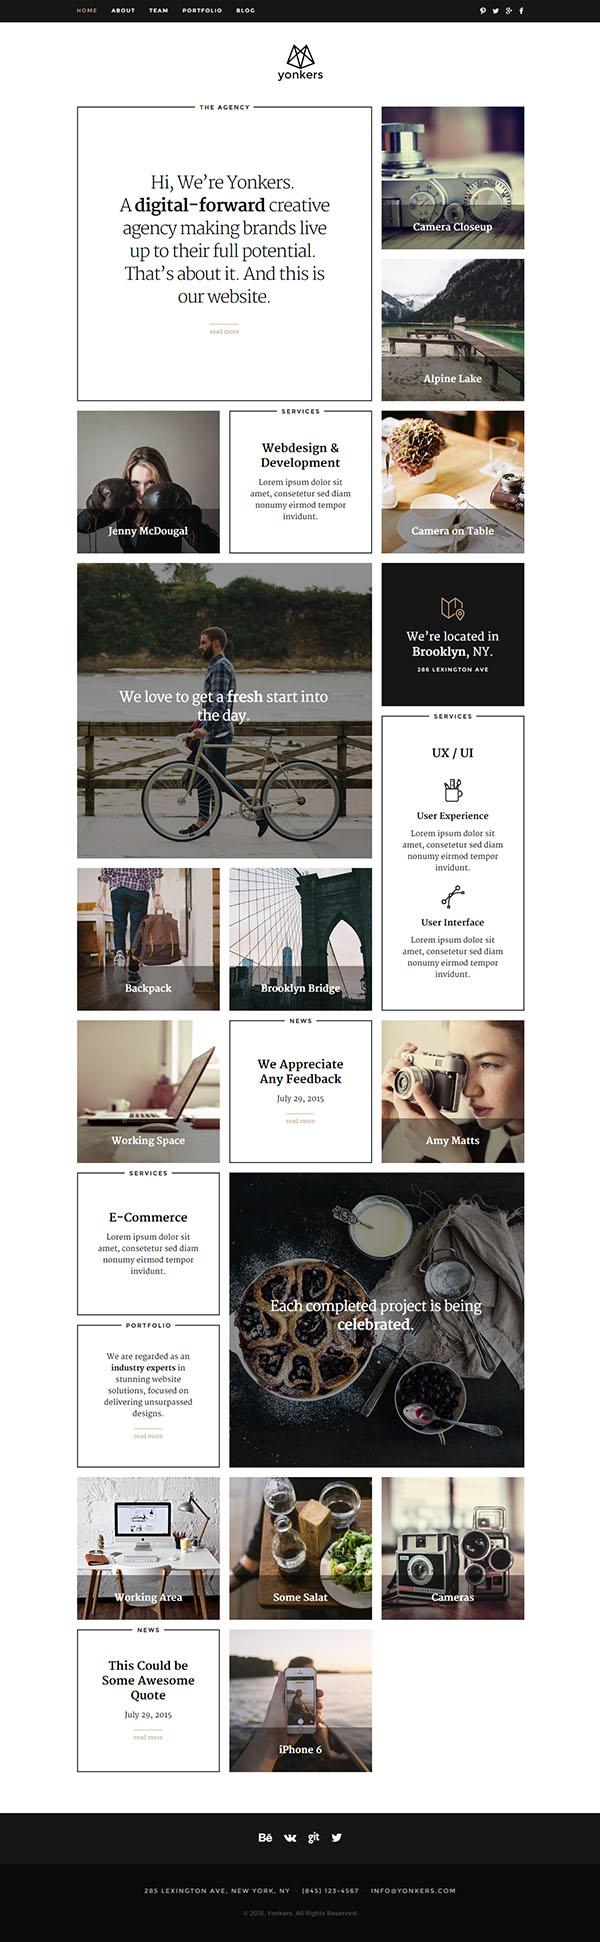 Yonkers – Responsive Retina-Ready HTML5 Portfolio